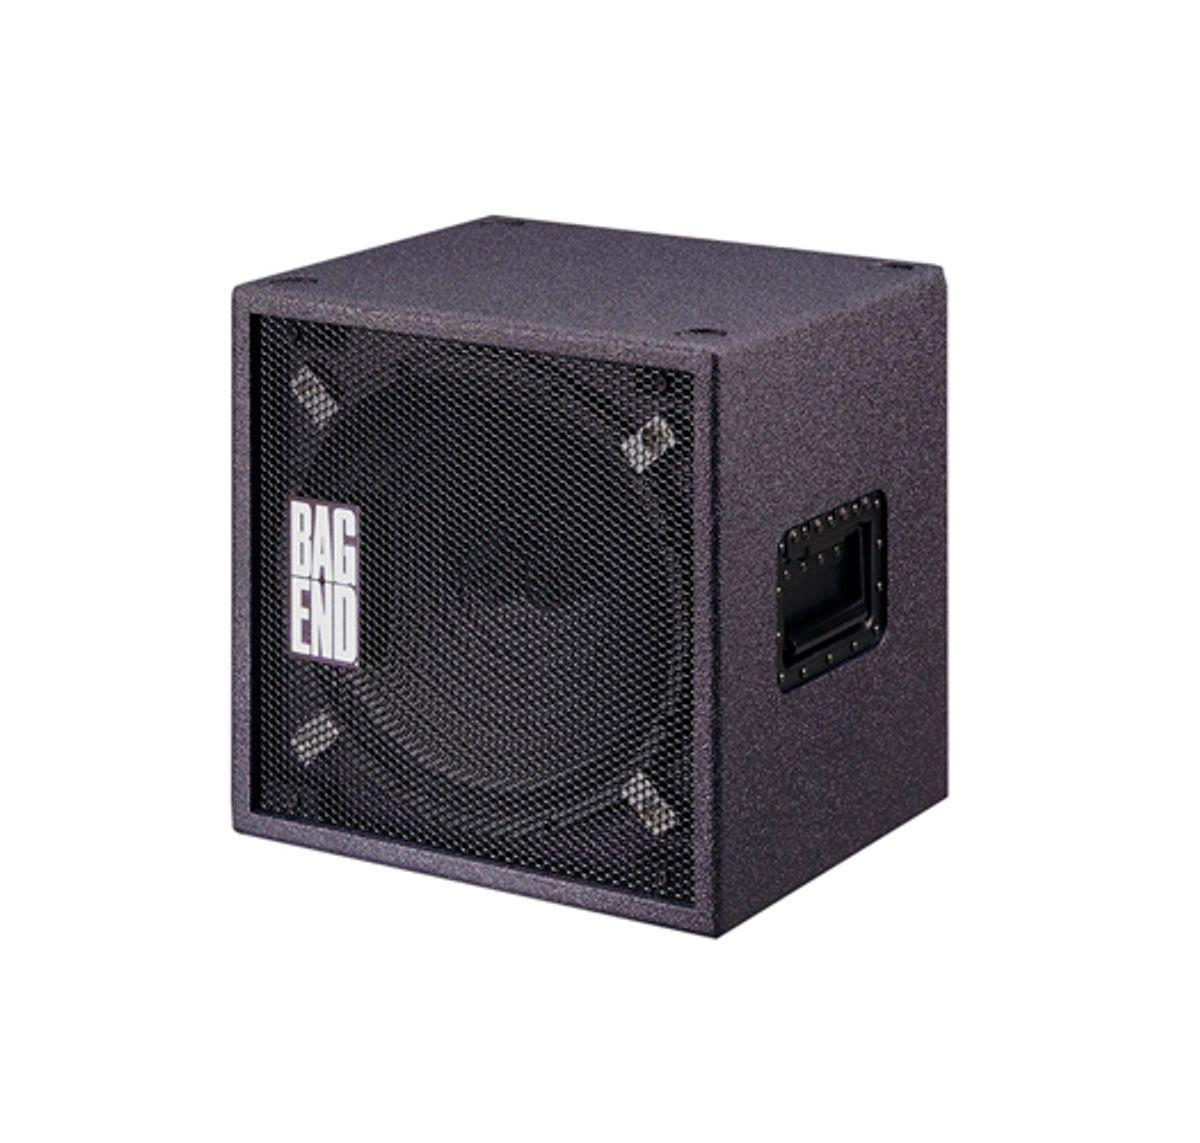 Bag End Announces the Nebula S15-N Cabinet